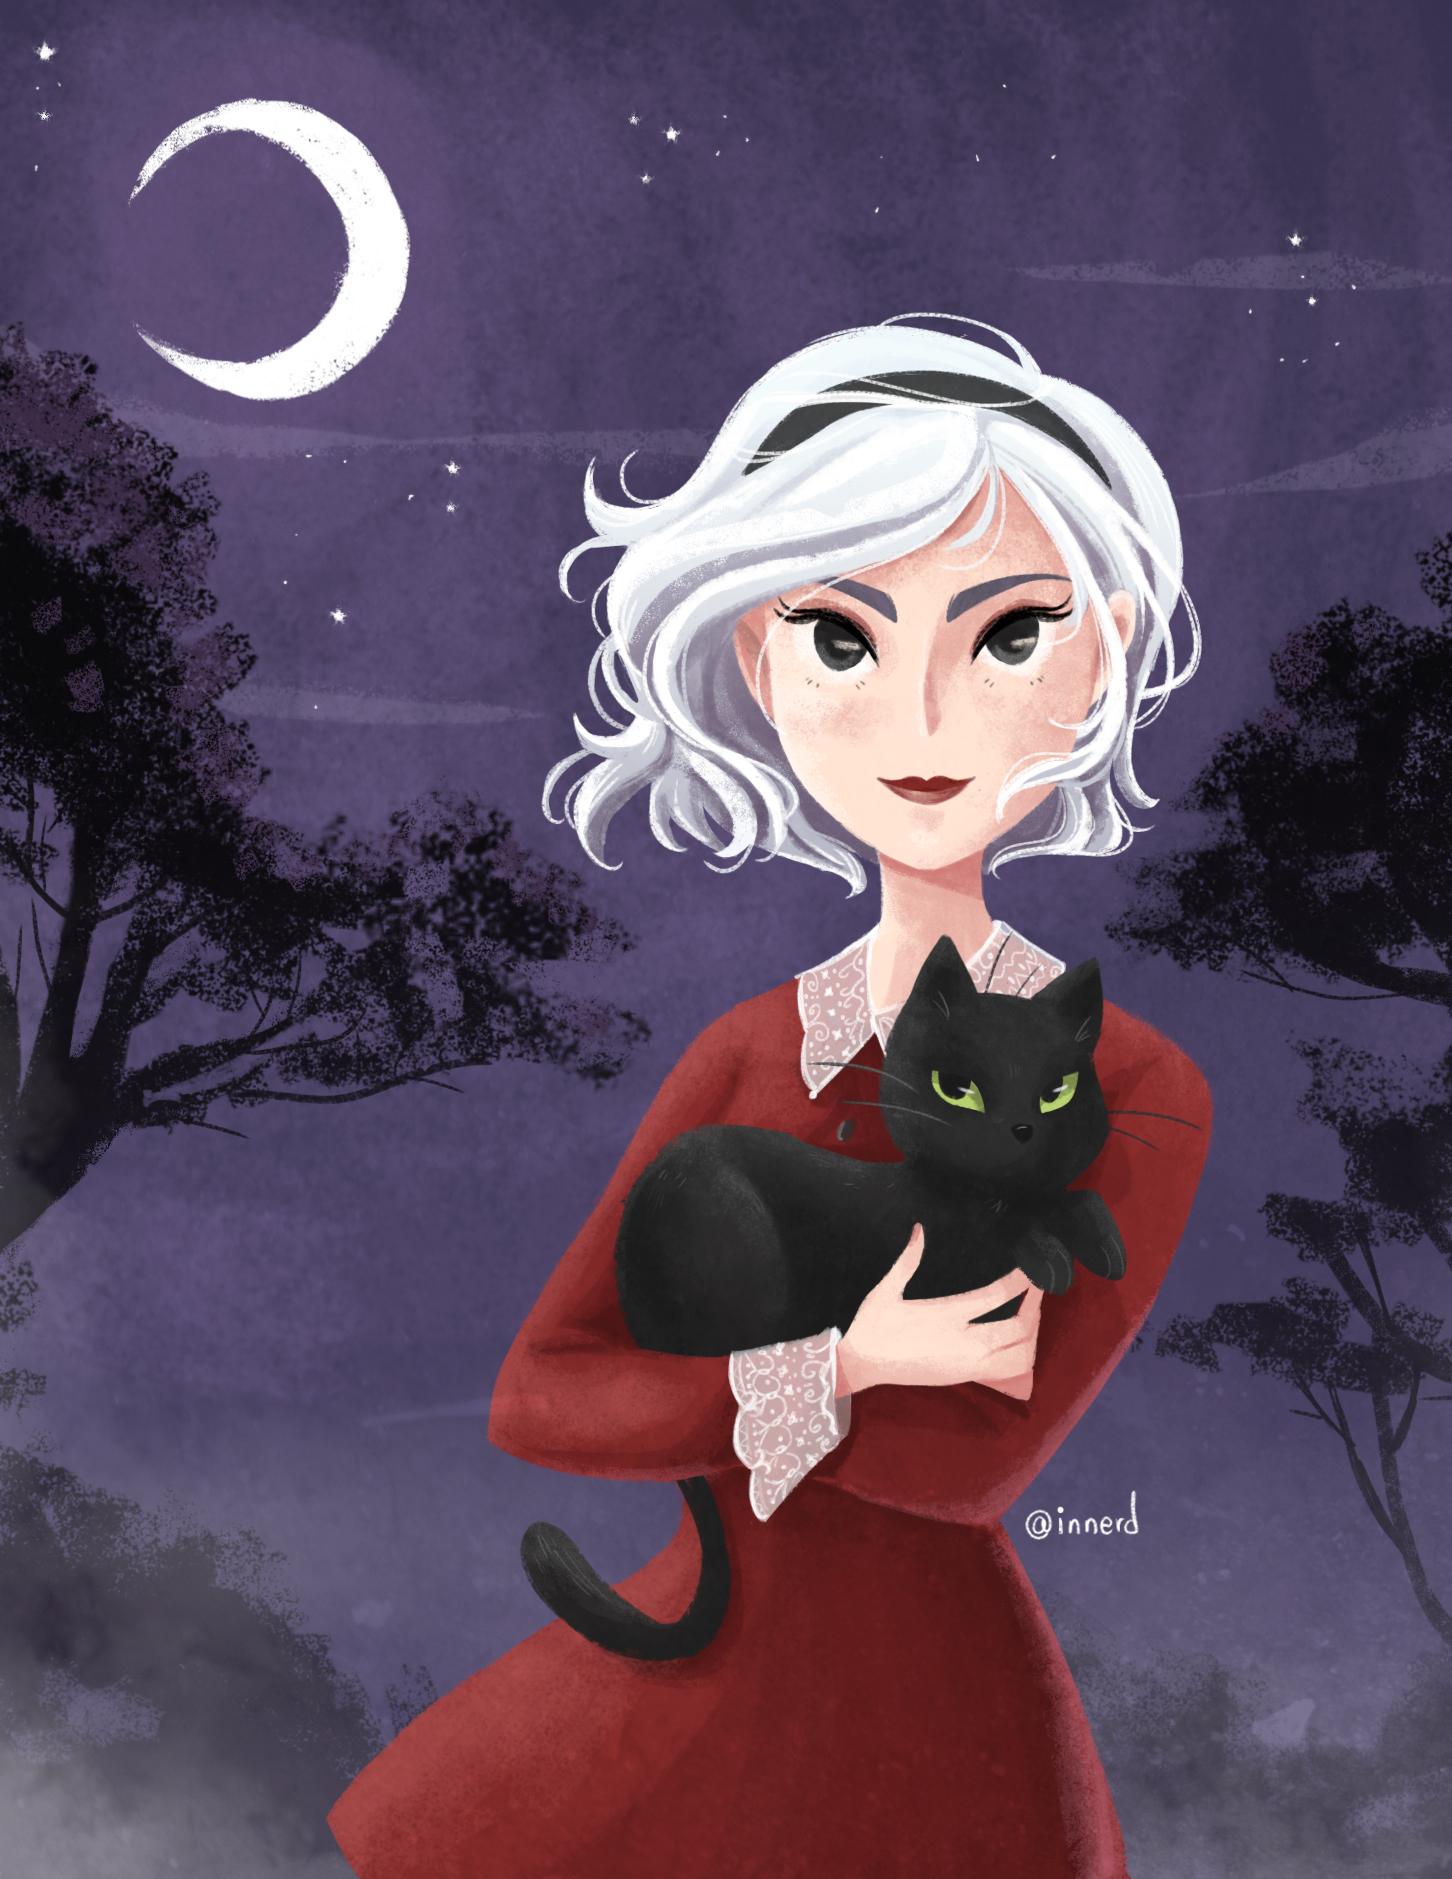 Sabrina Spellman by innerd